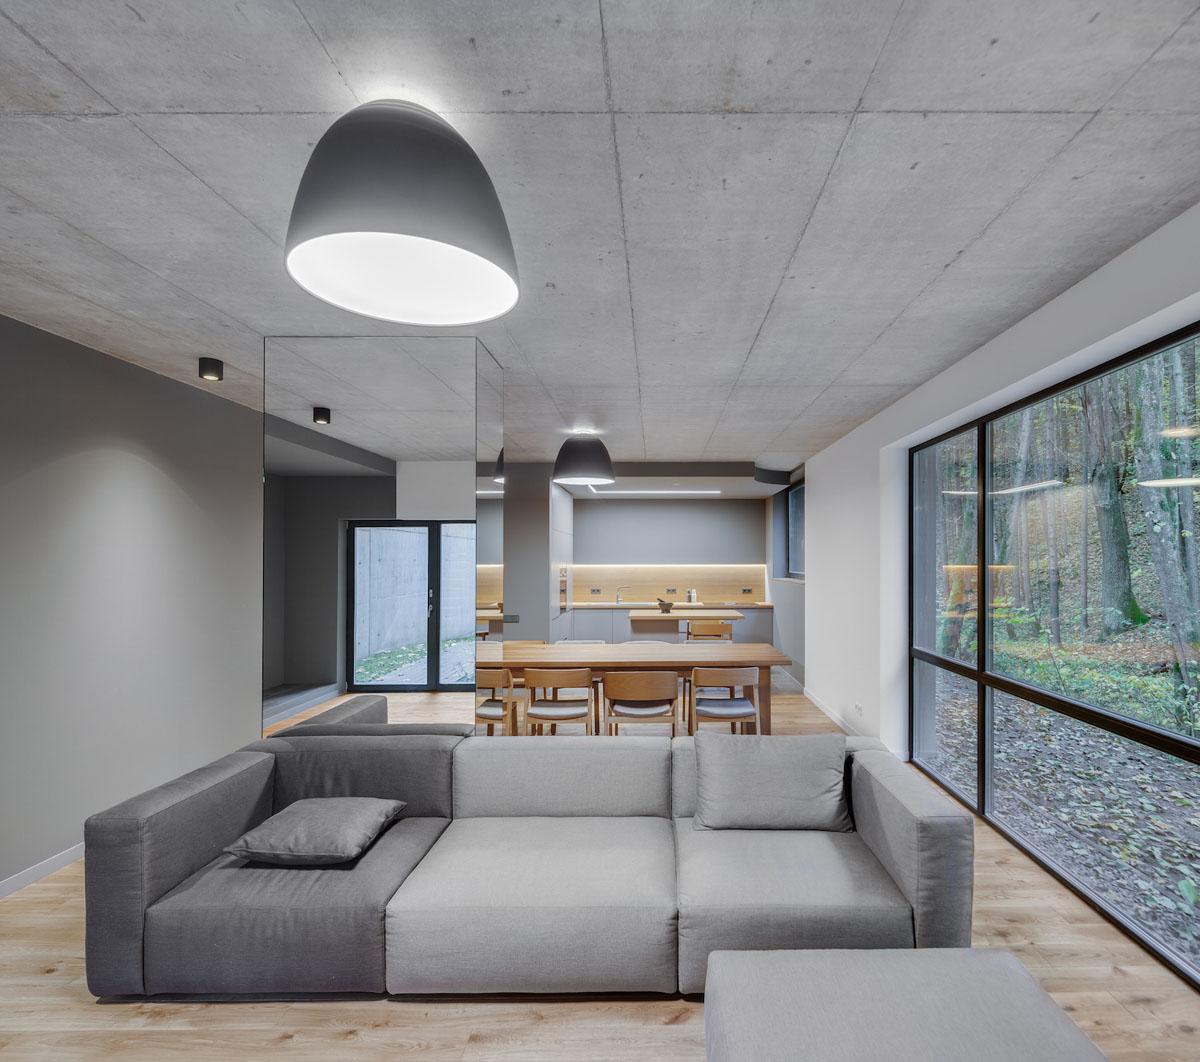 II-oji vieta – butas Rasų namuose (studija YCL)